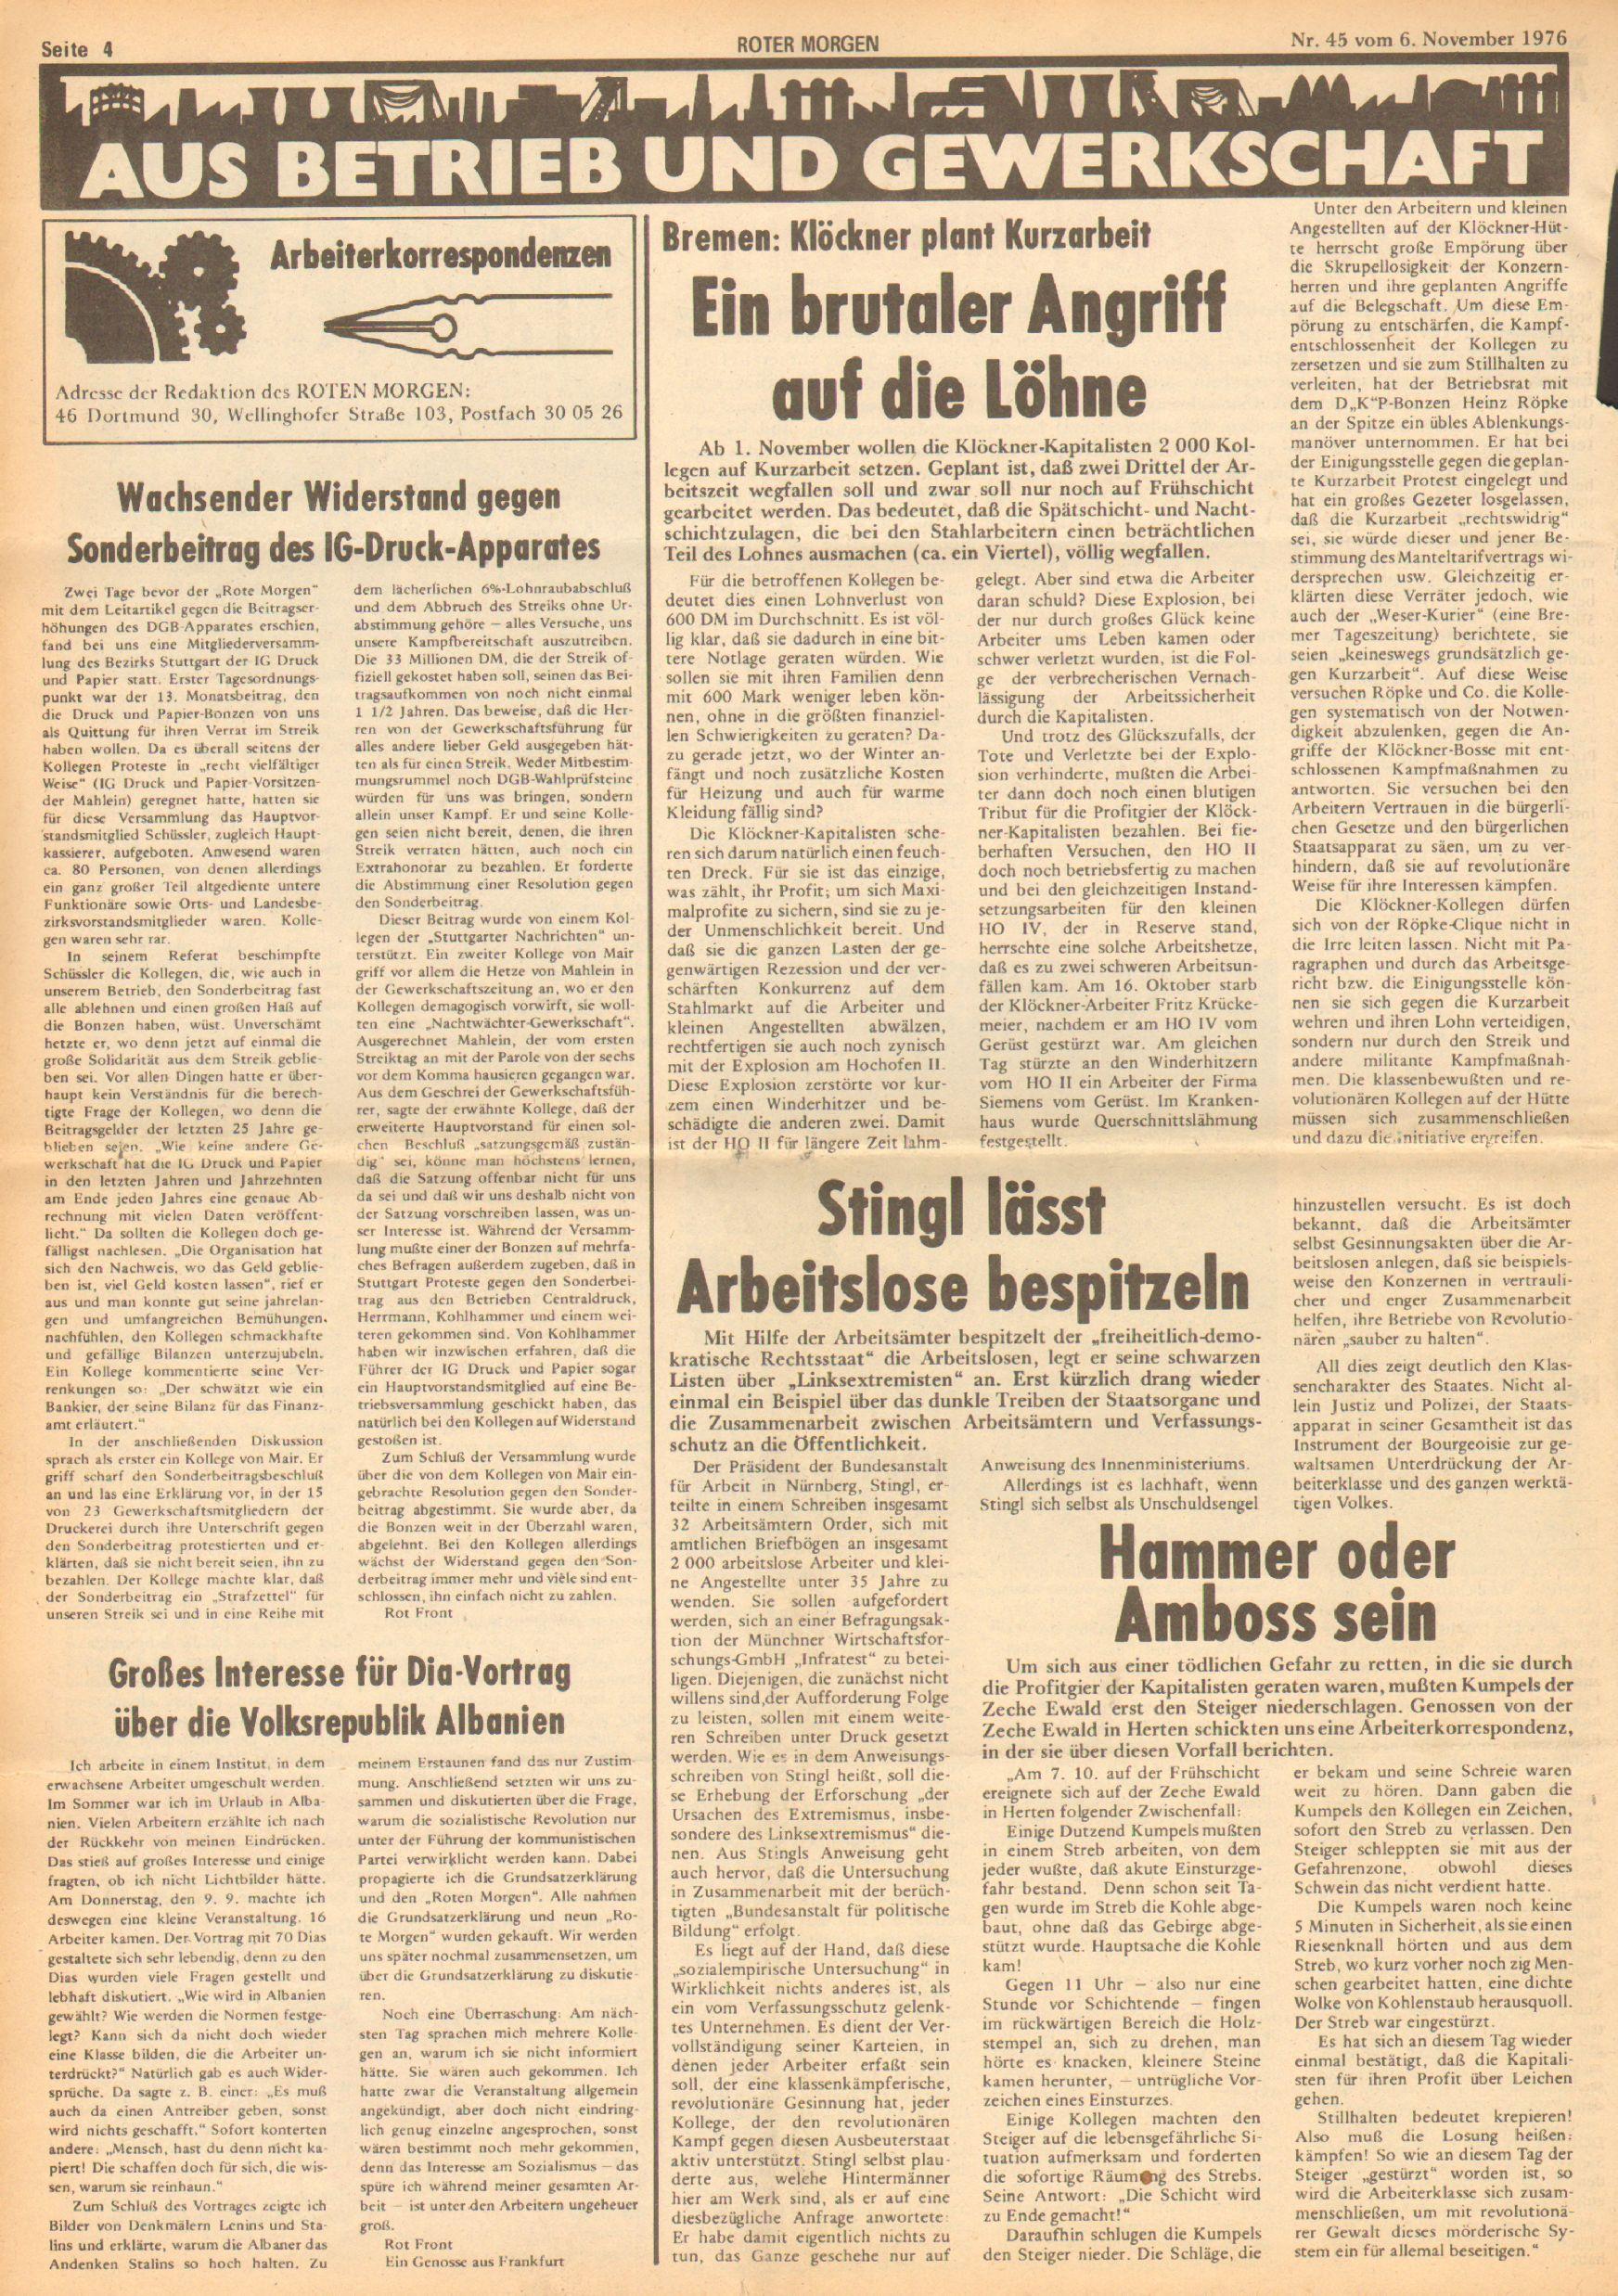 Roter Morgen, 10. Jg., 6. November 1976, Nr. 45, Seite 4